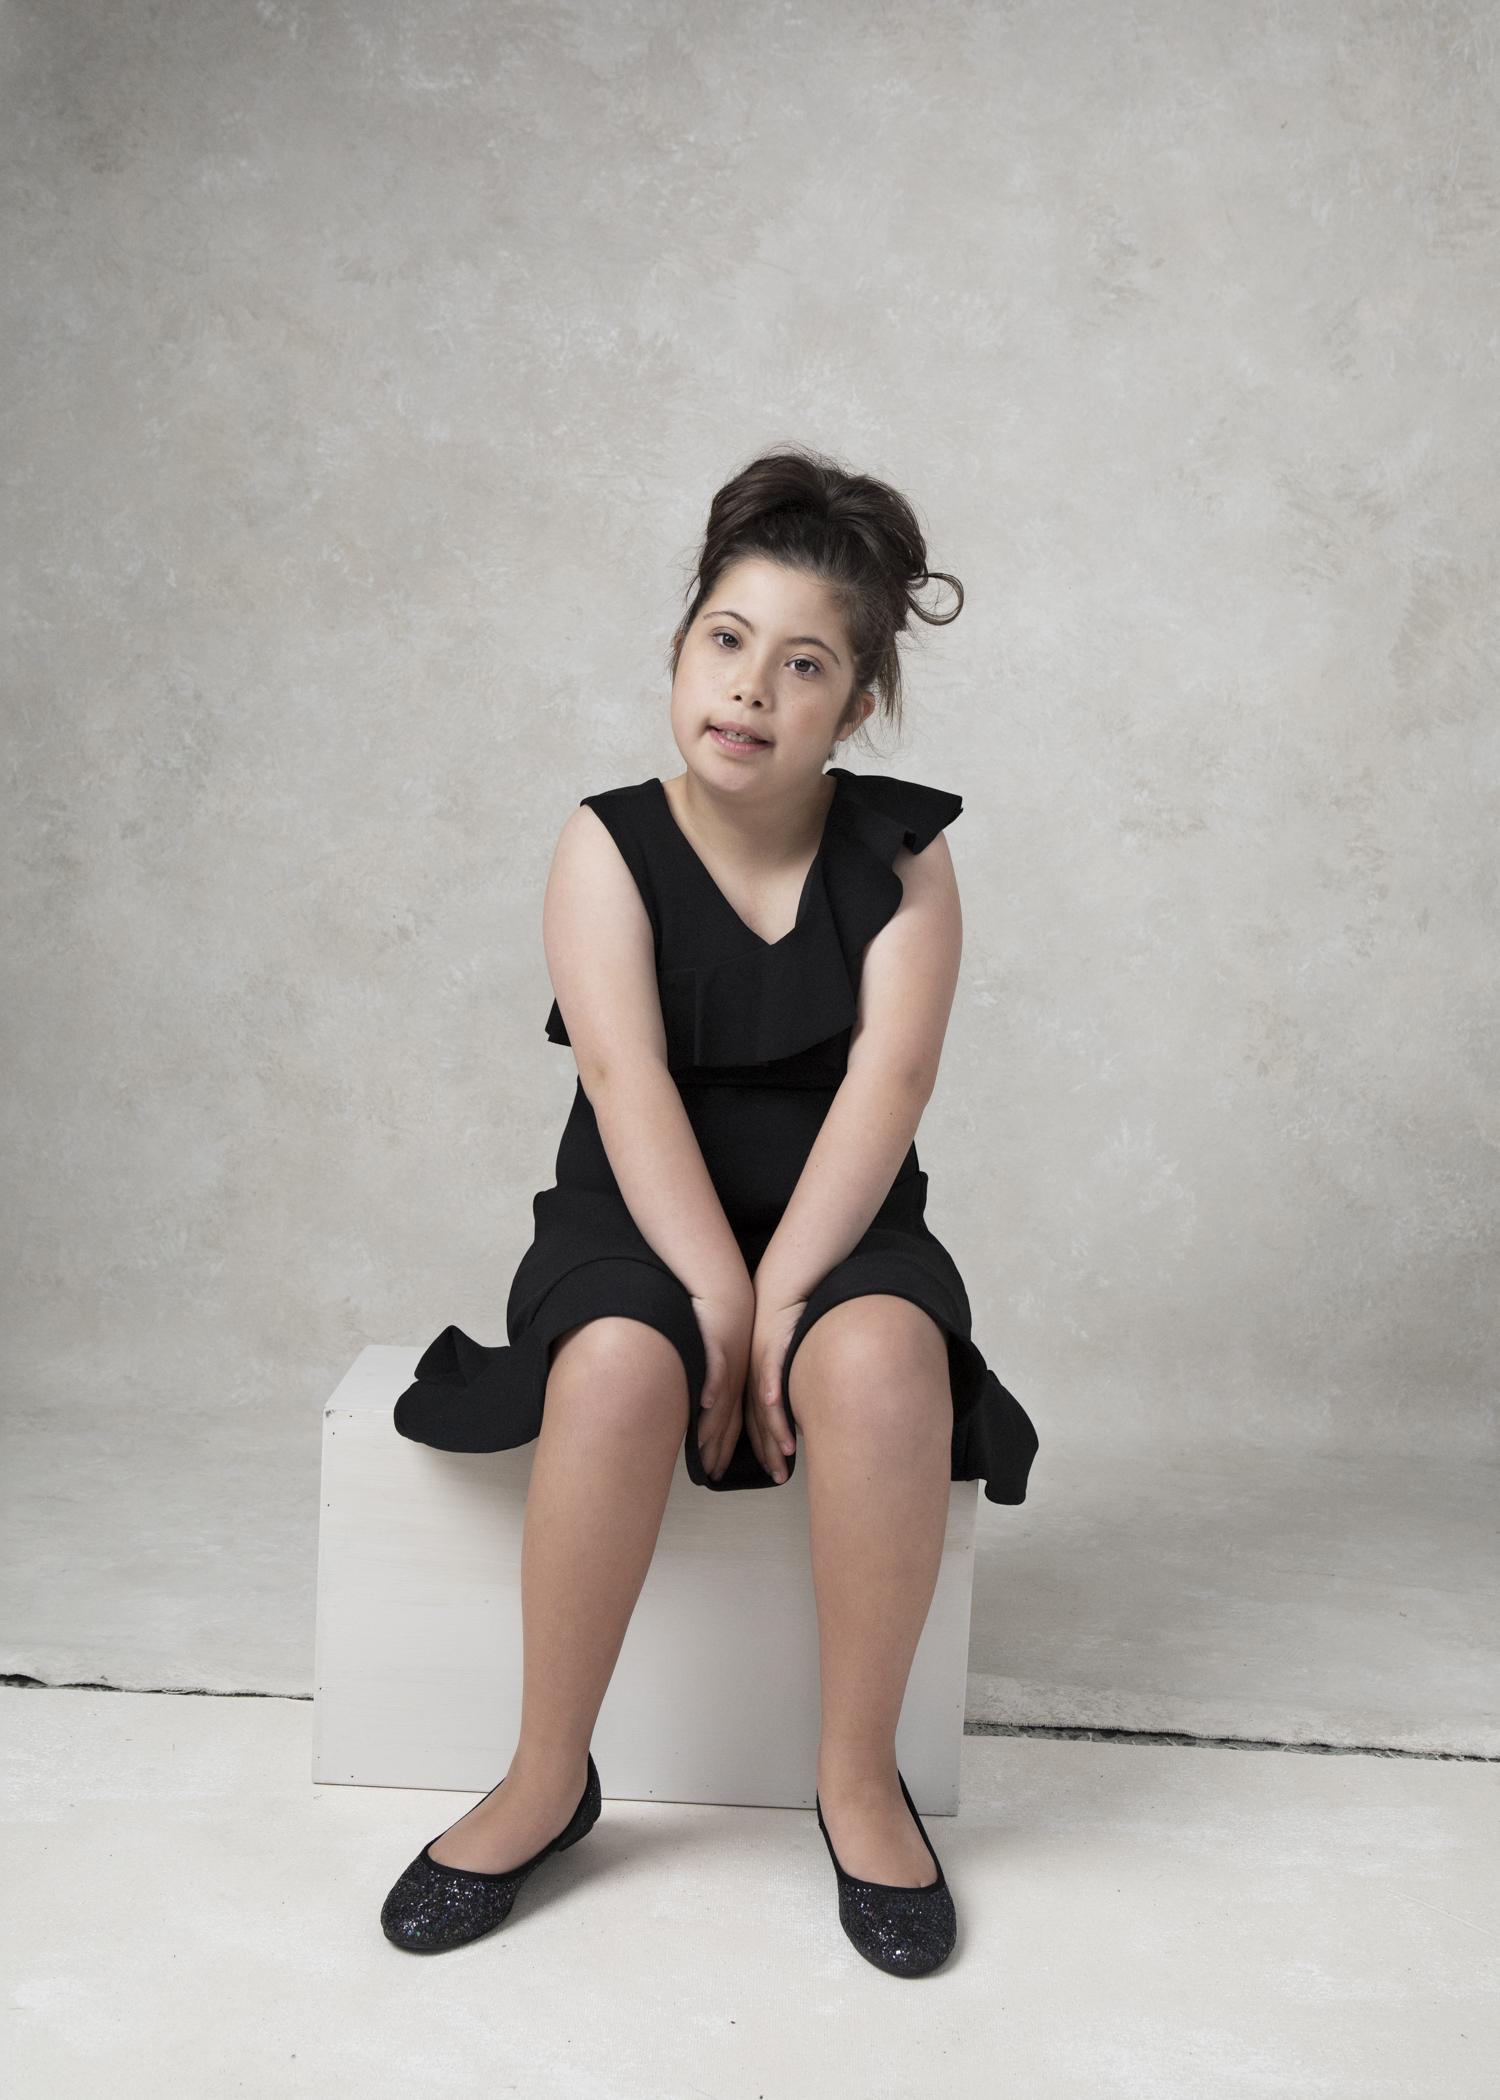 5X7%22 Minilab Lustre Generations Latinas3Analia Paino Portrait Photography.jpg